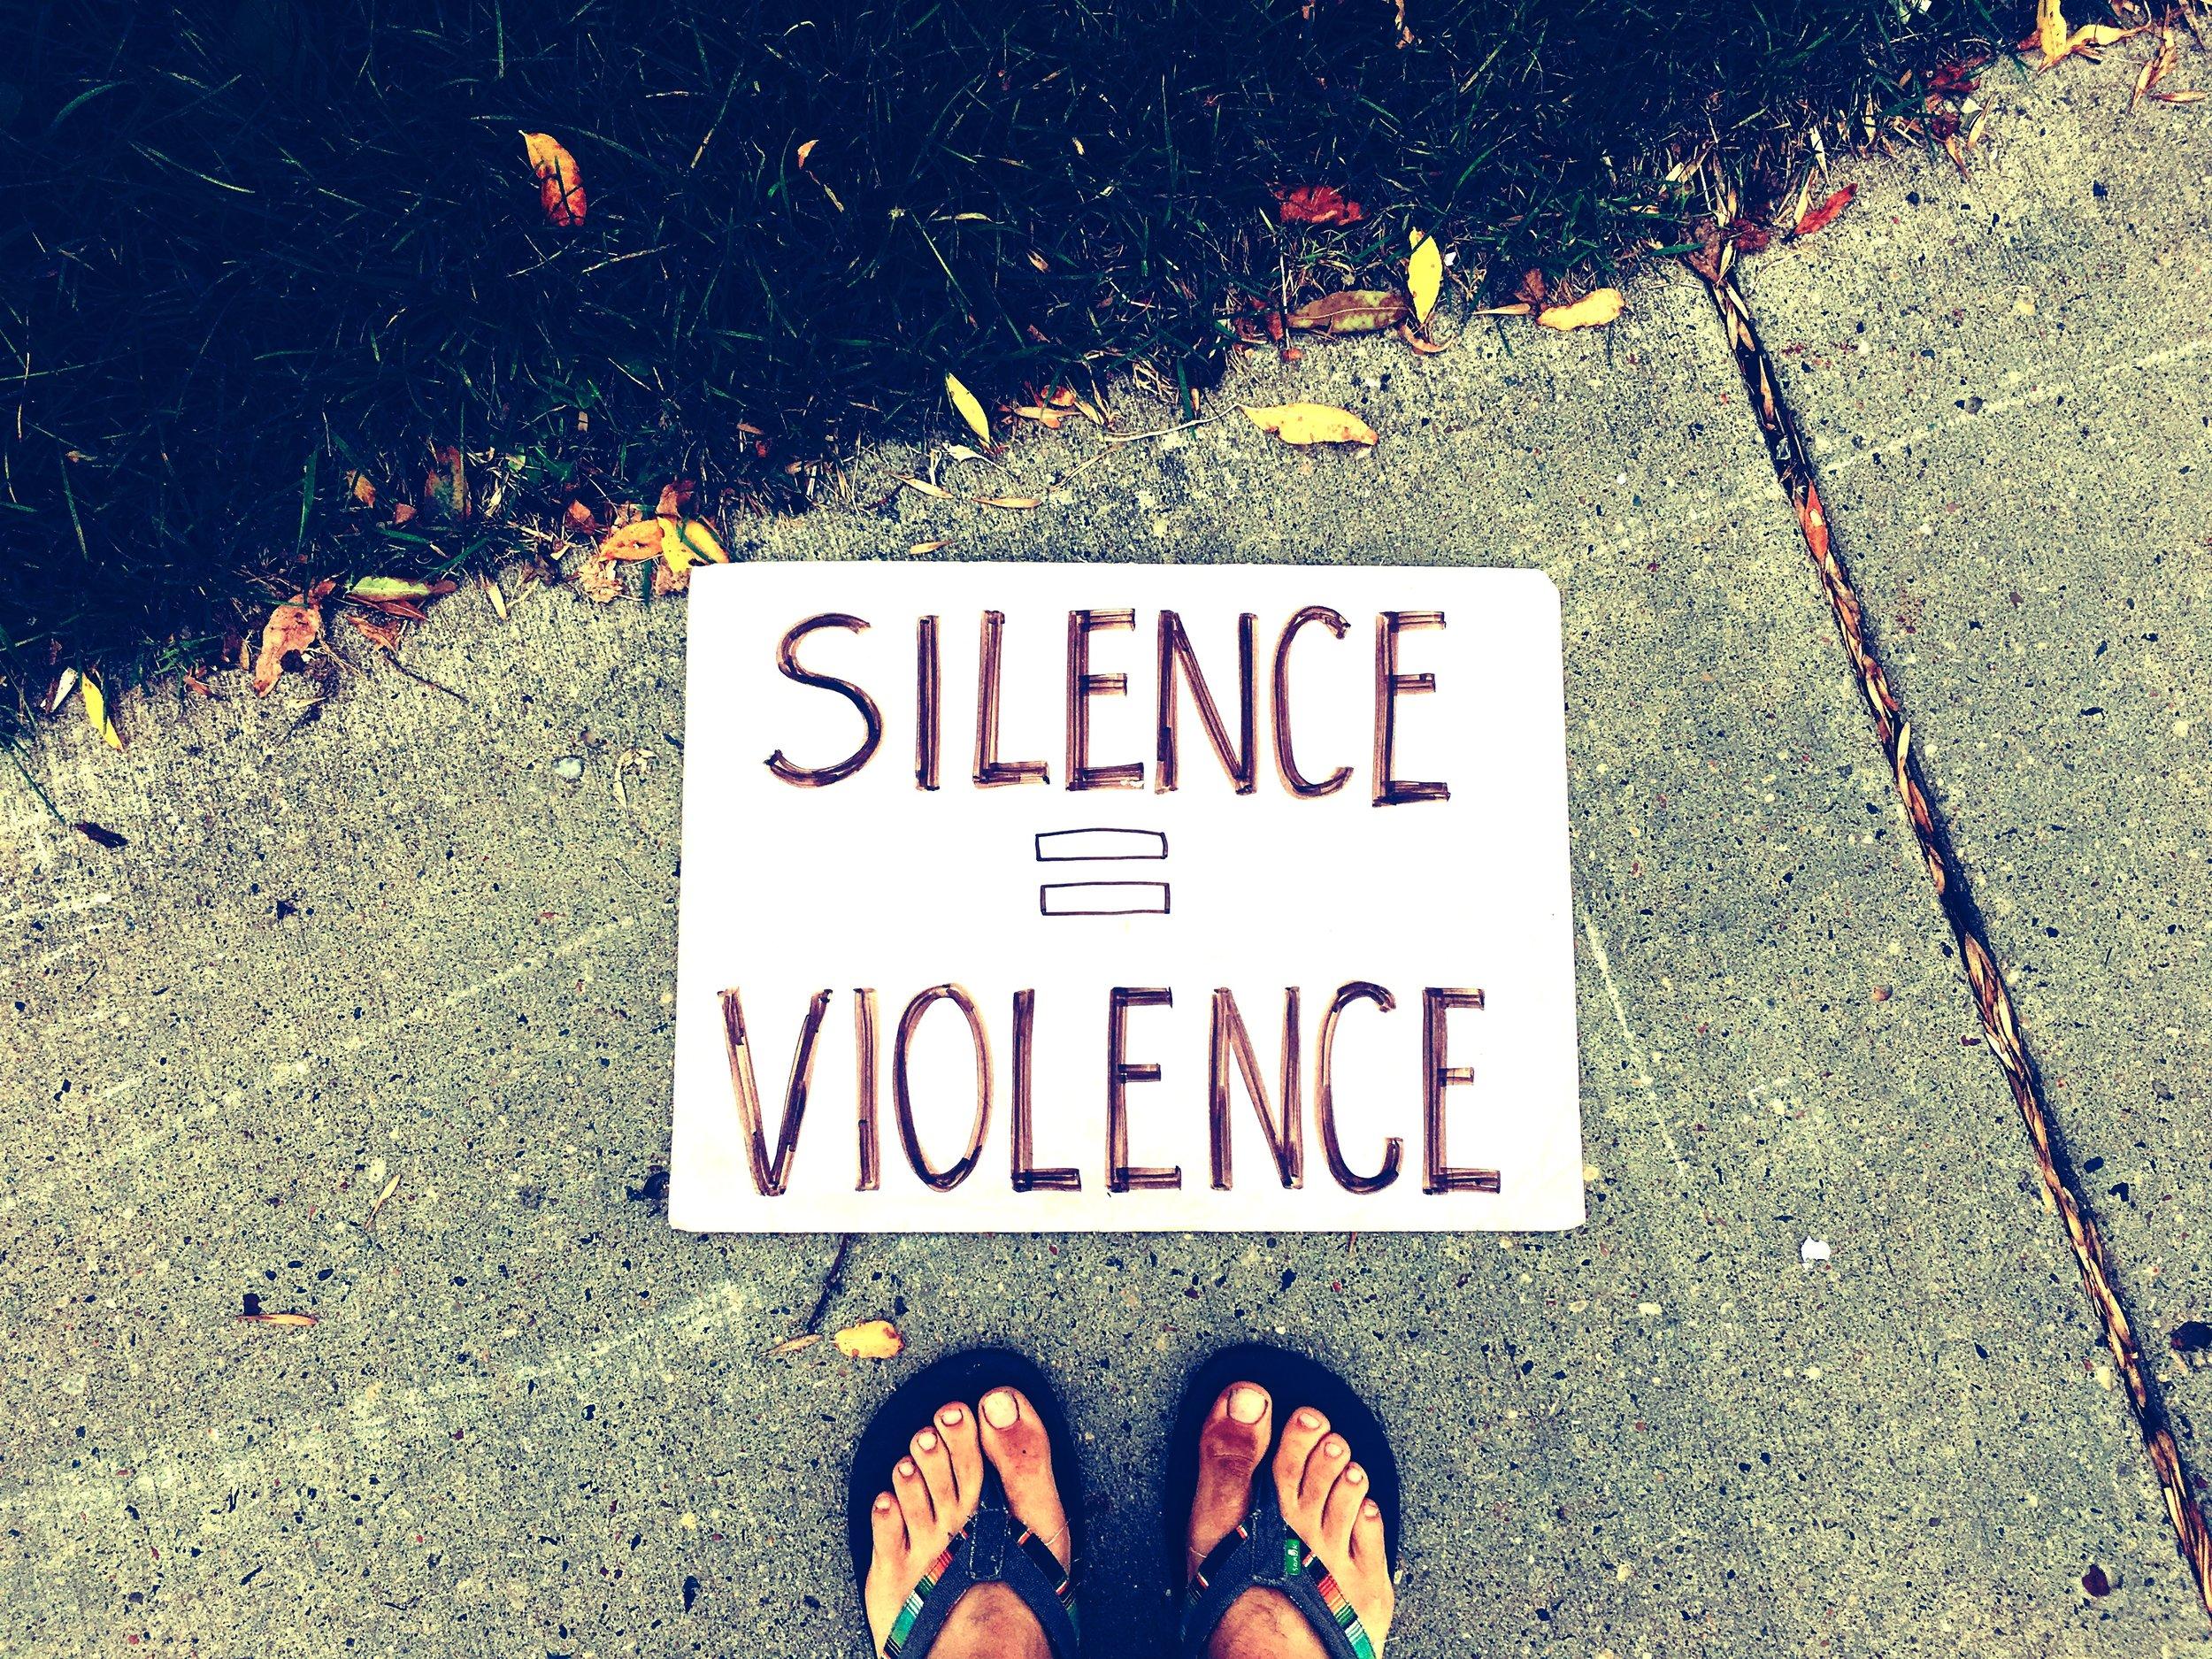 SilenceViolence.jpeg